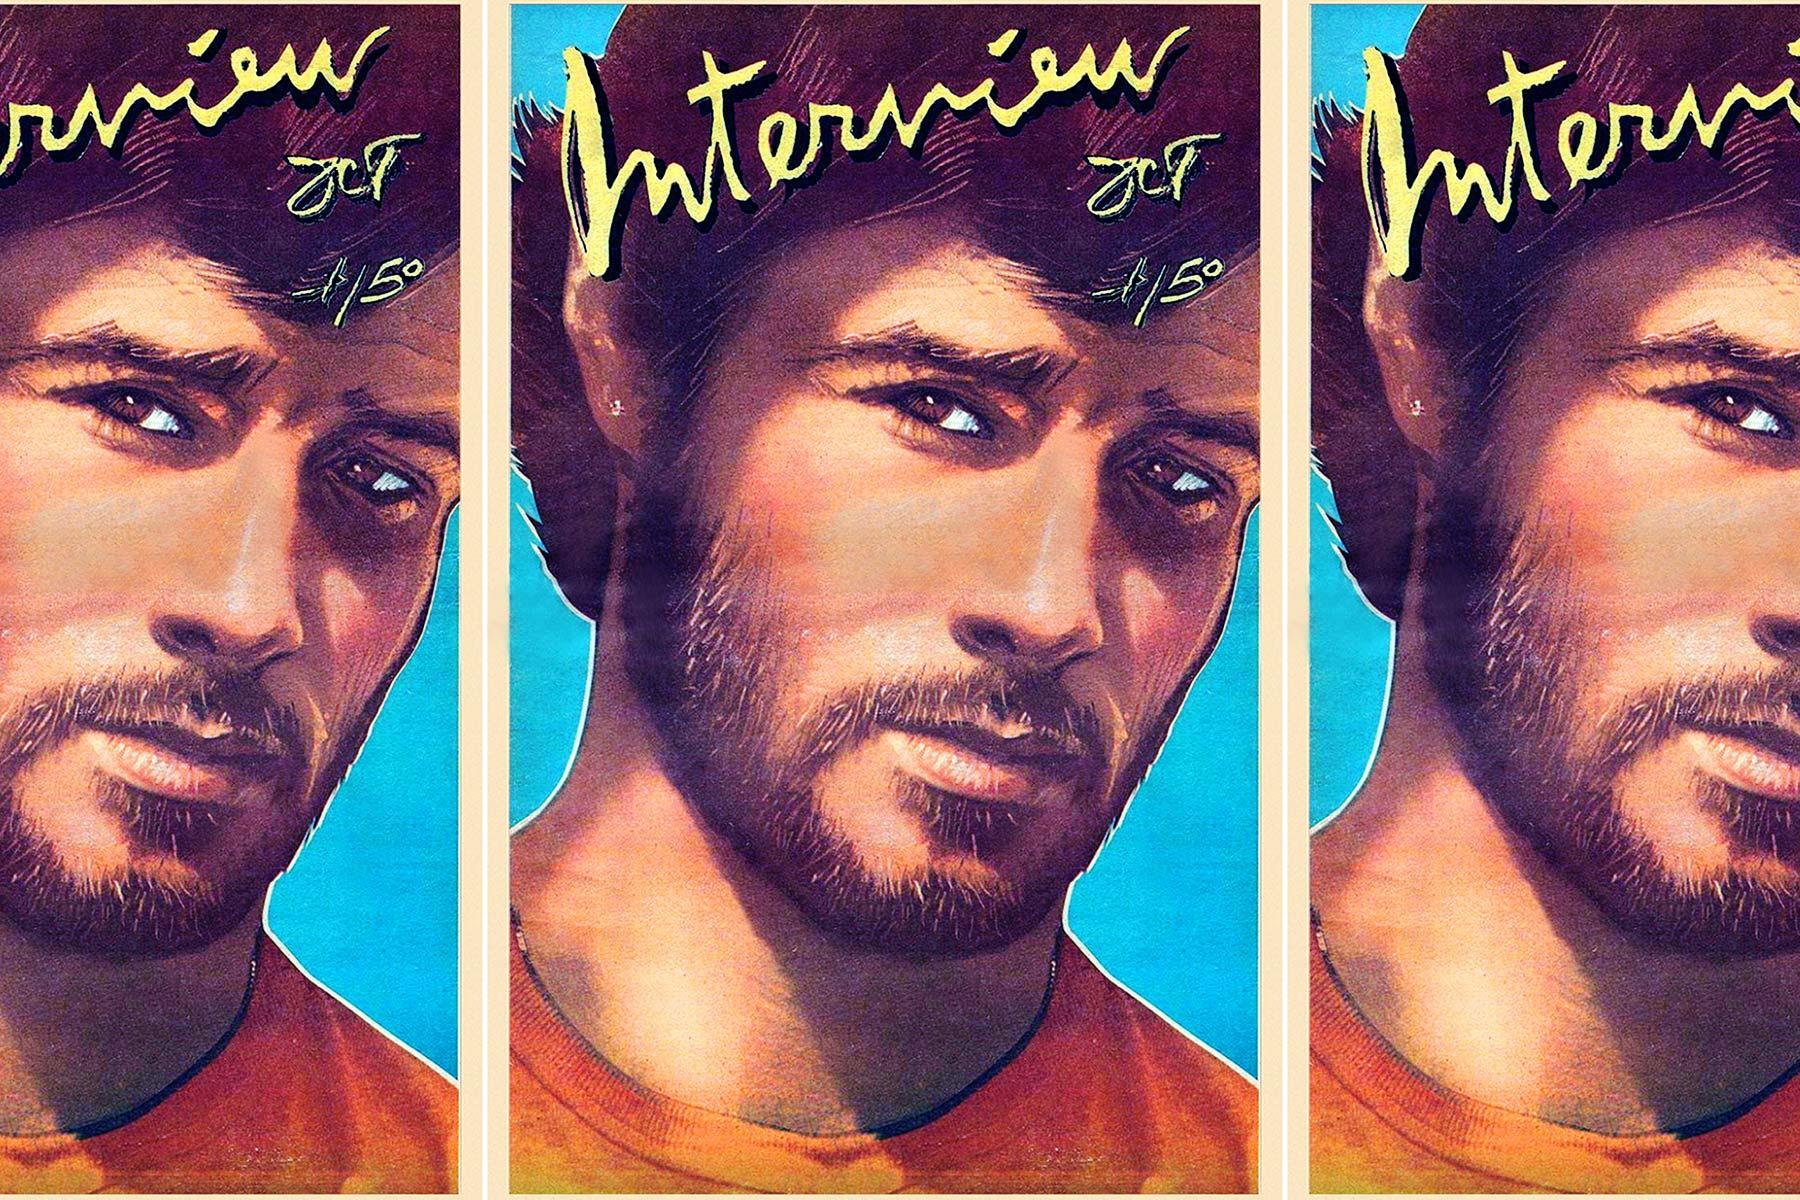 Brad Davis by Richard Bernstein. Starmaker by Roger Padhila & Mauricio Padhila. Rizzoli Books. Ponyboy magazine.